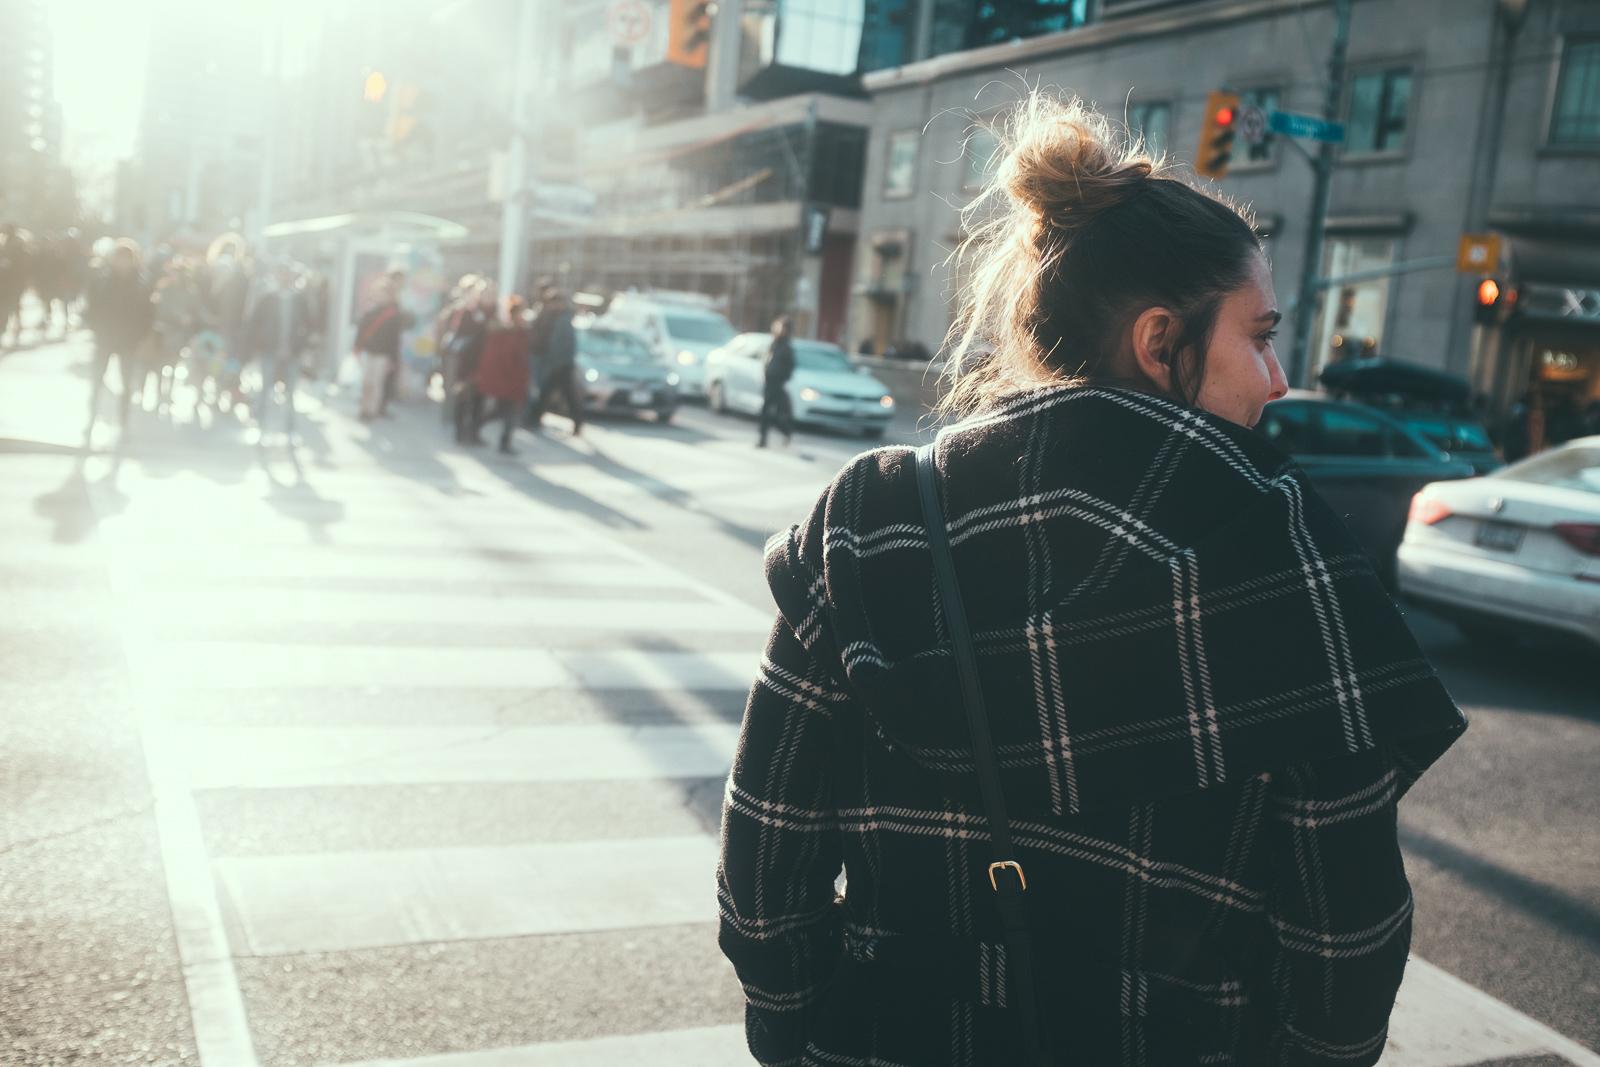 toronto_street-22.jpg